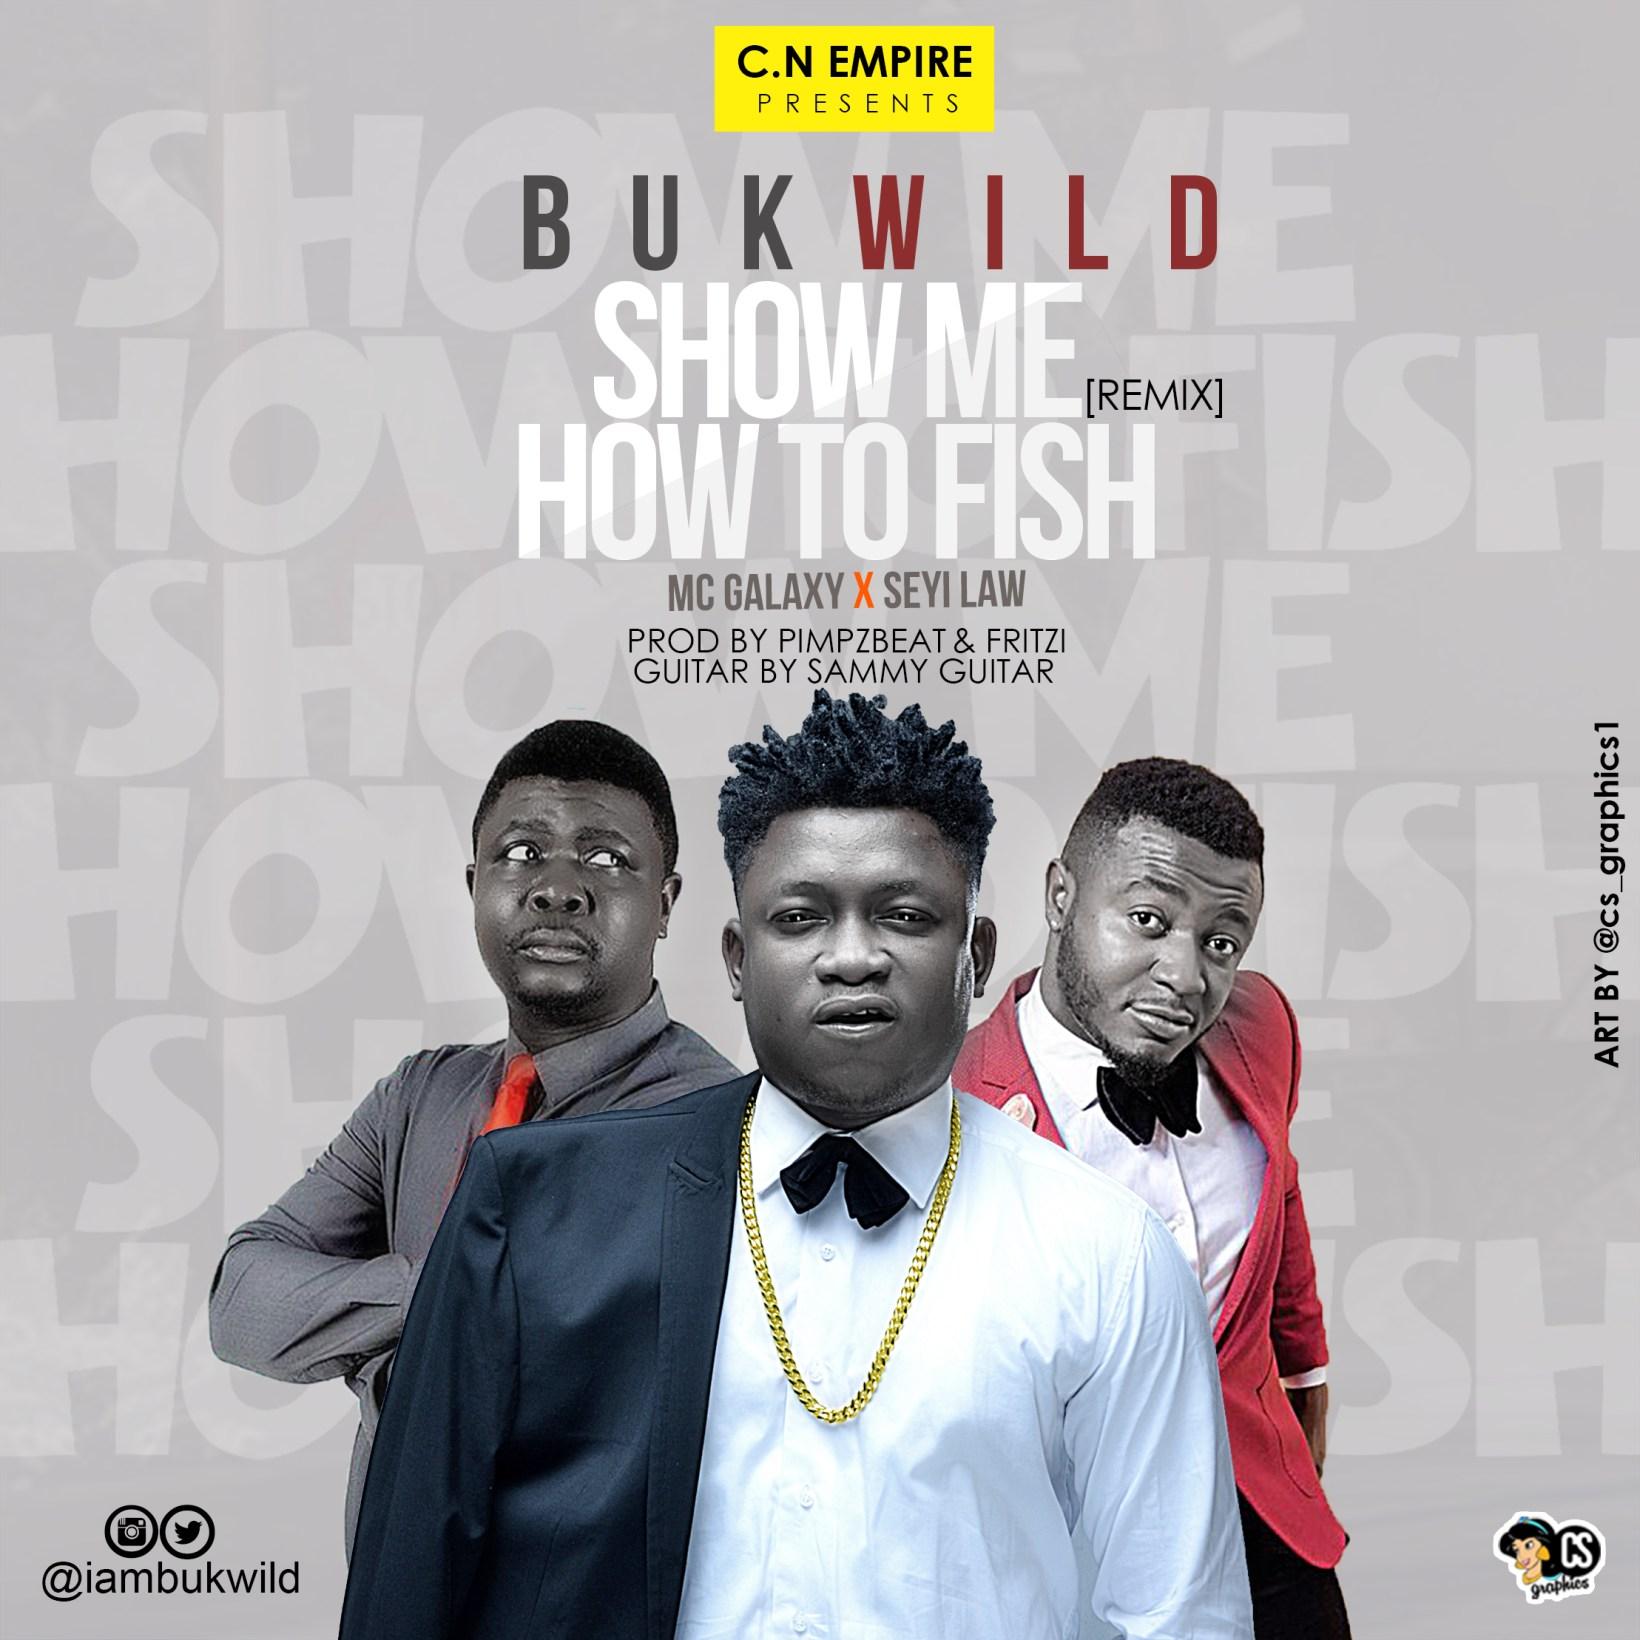 bukwild-show-me-how-to-fish